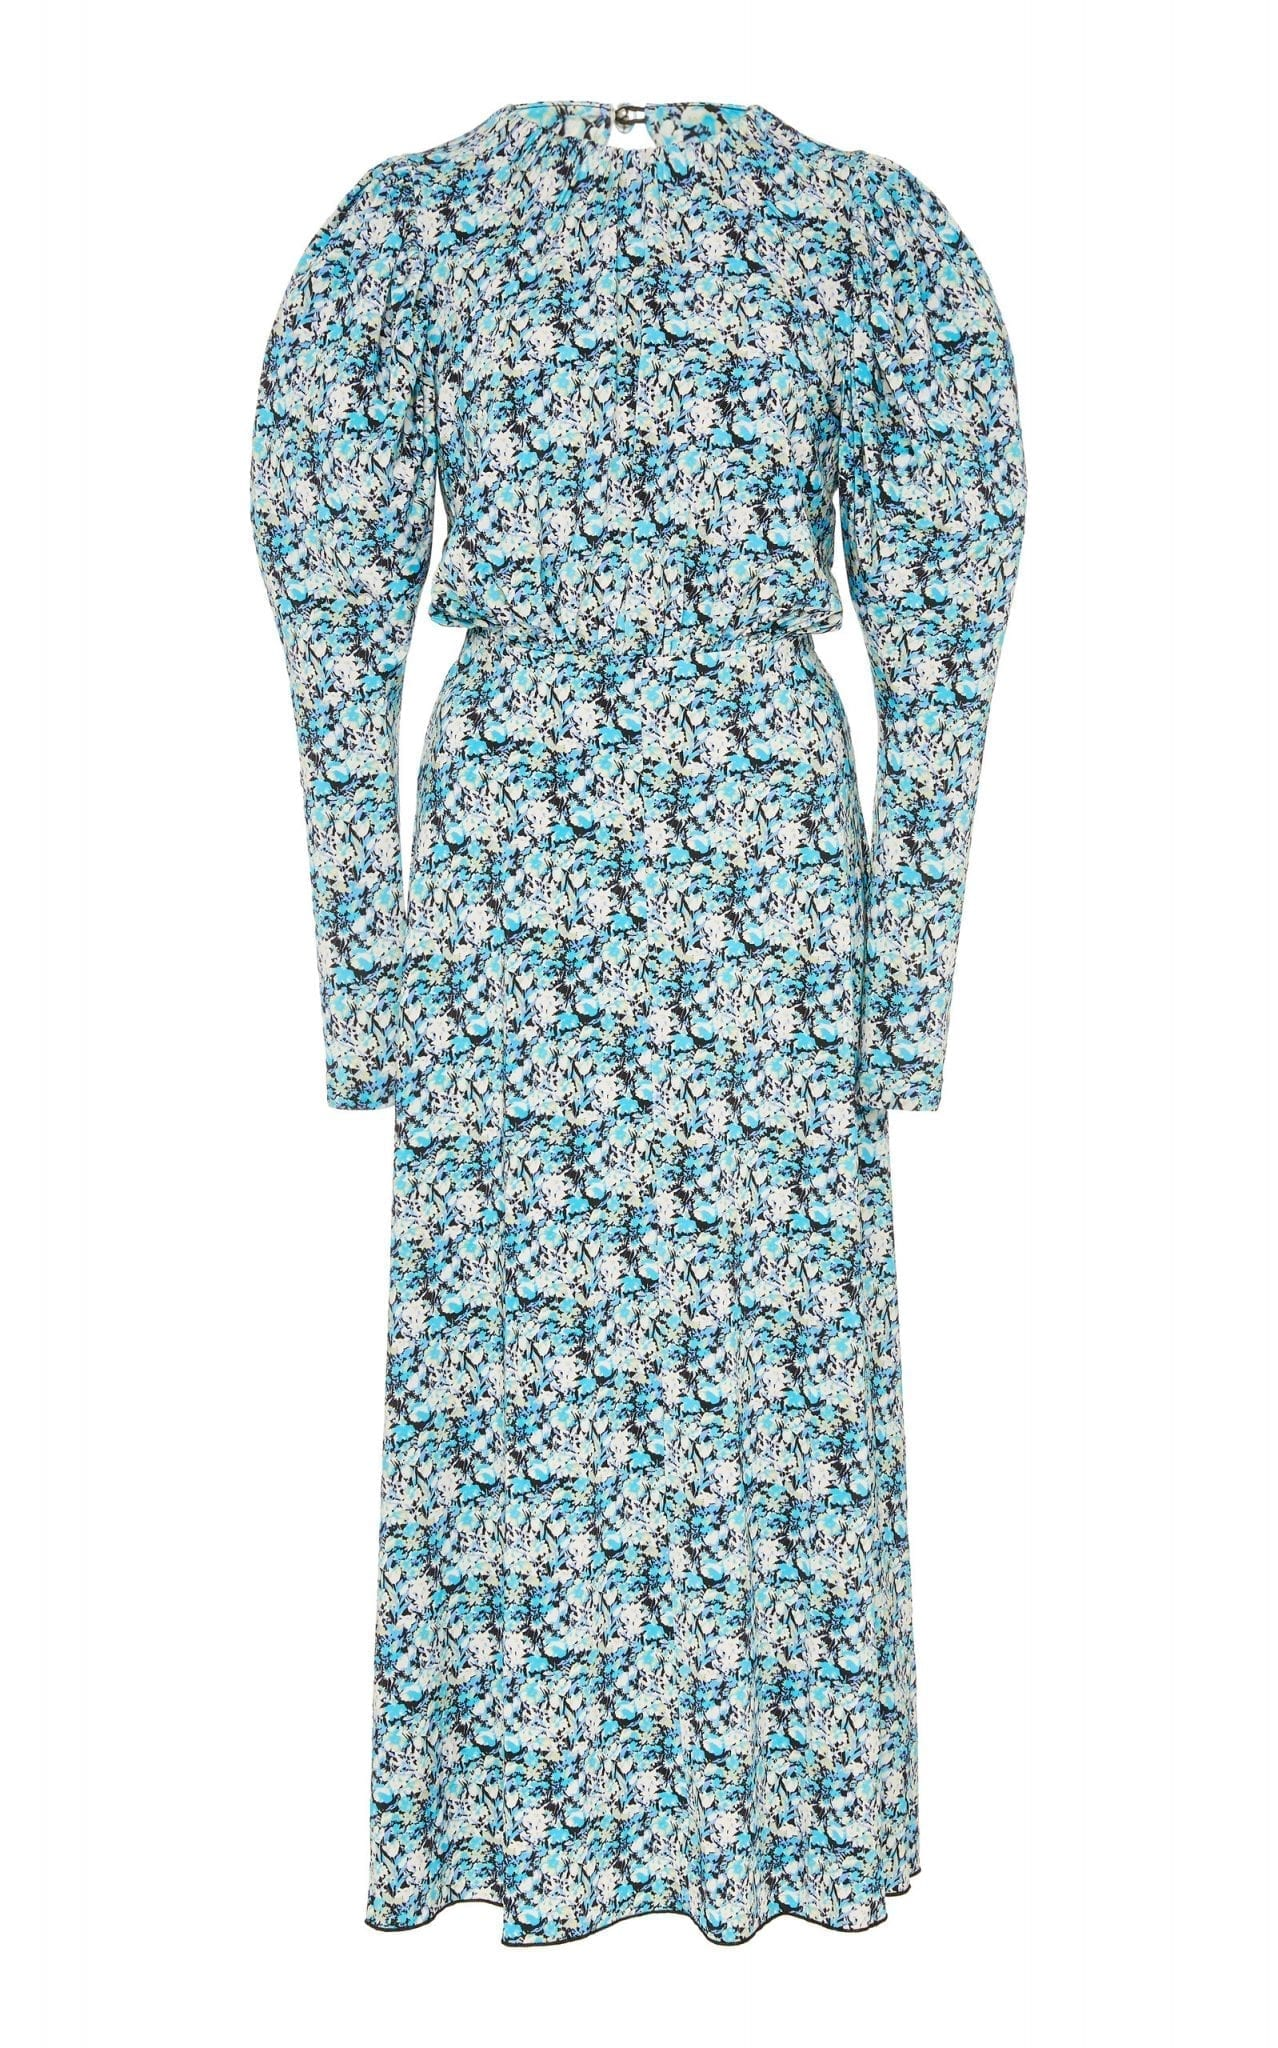 ROTATE Number 57 ReRunner Crepe Midi Dress